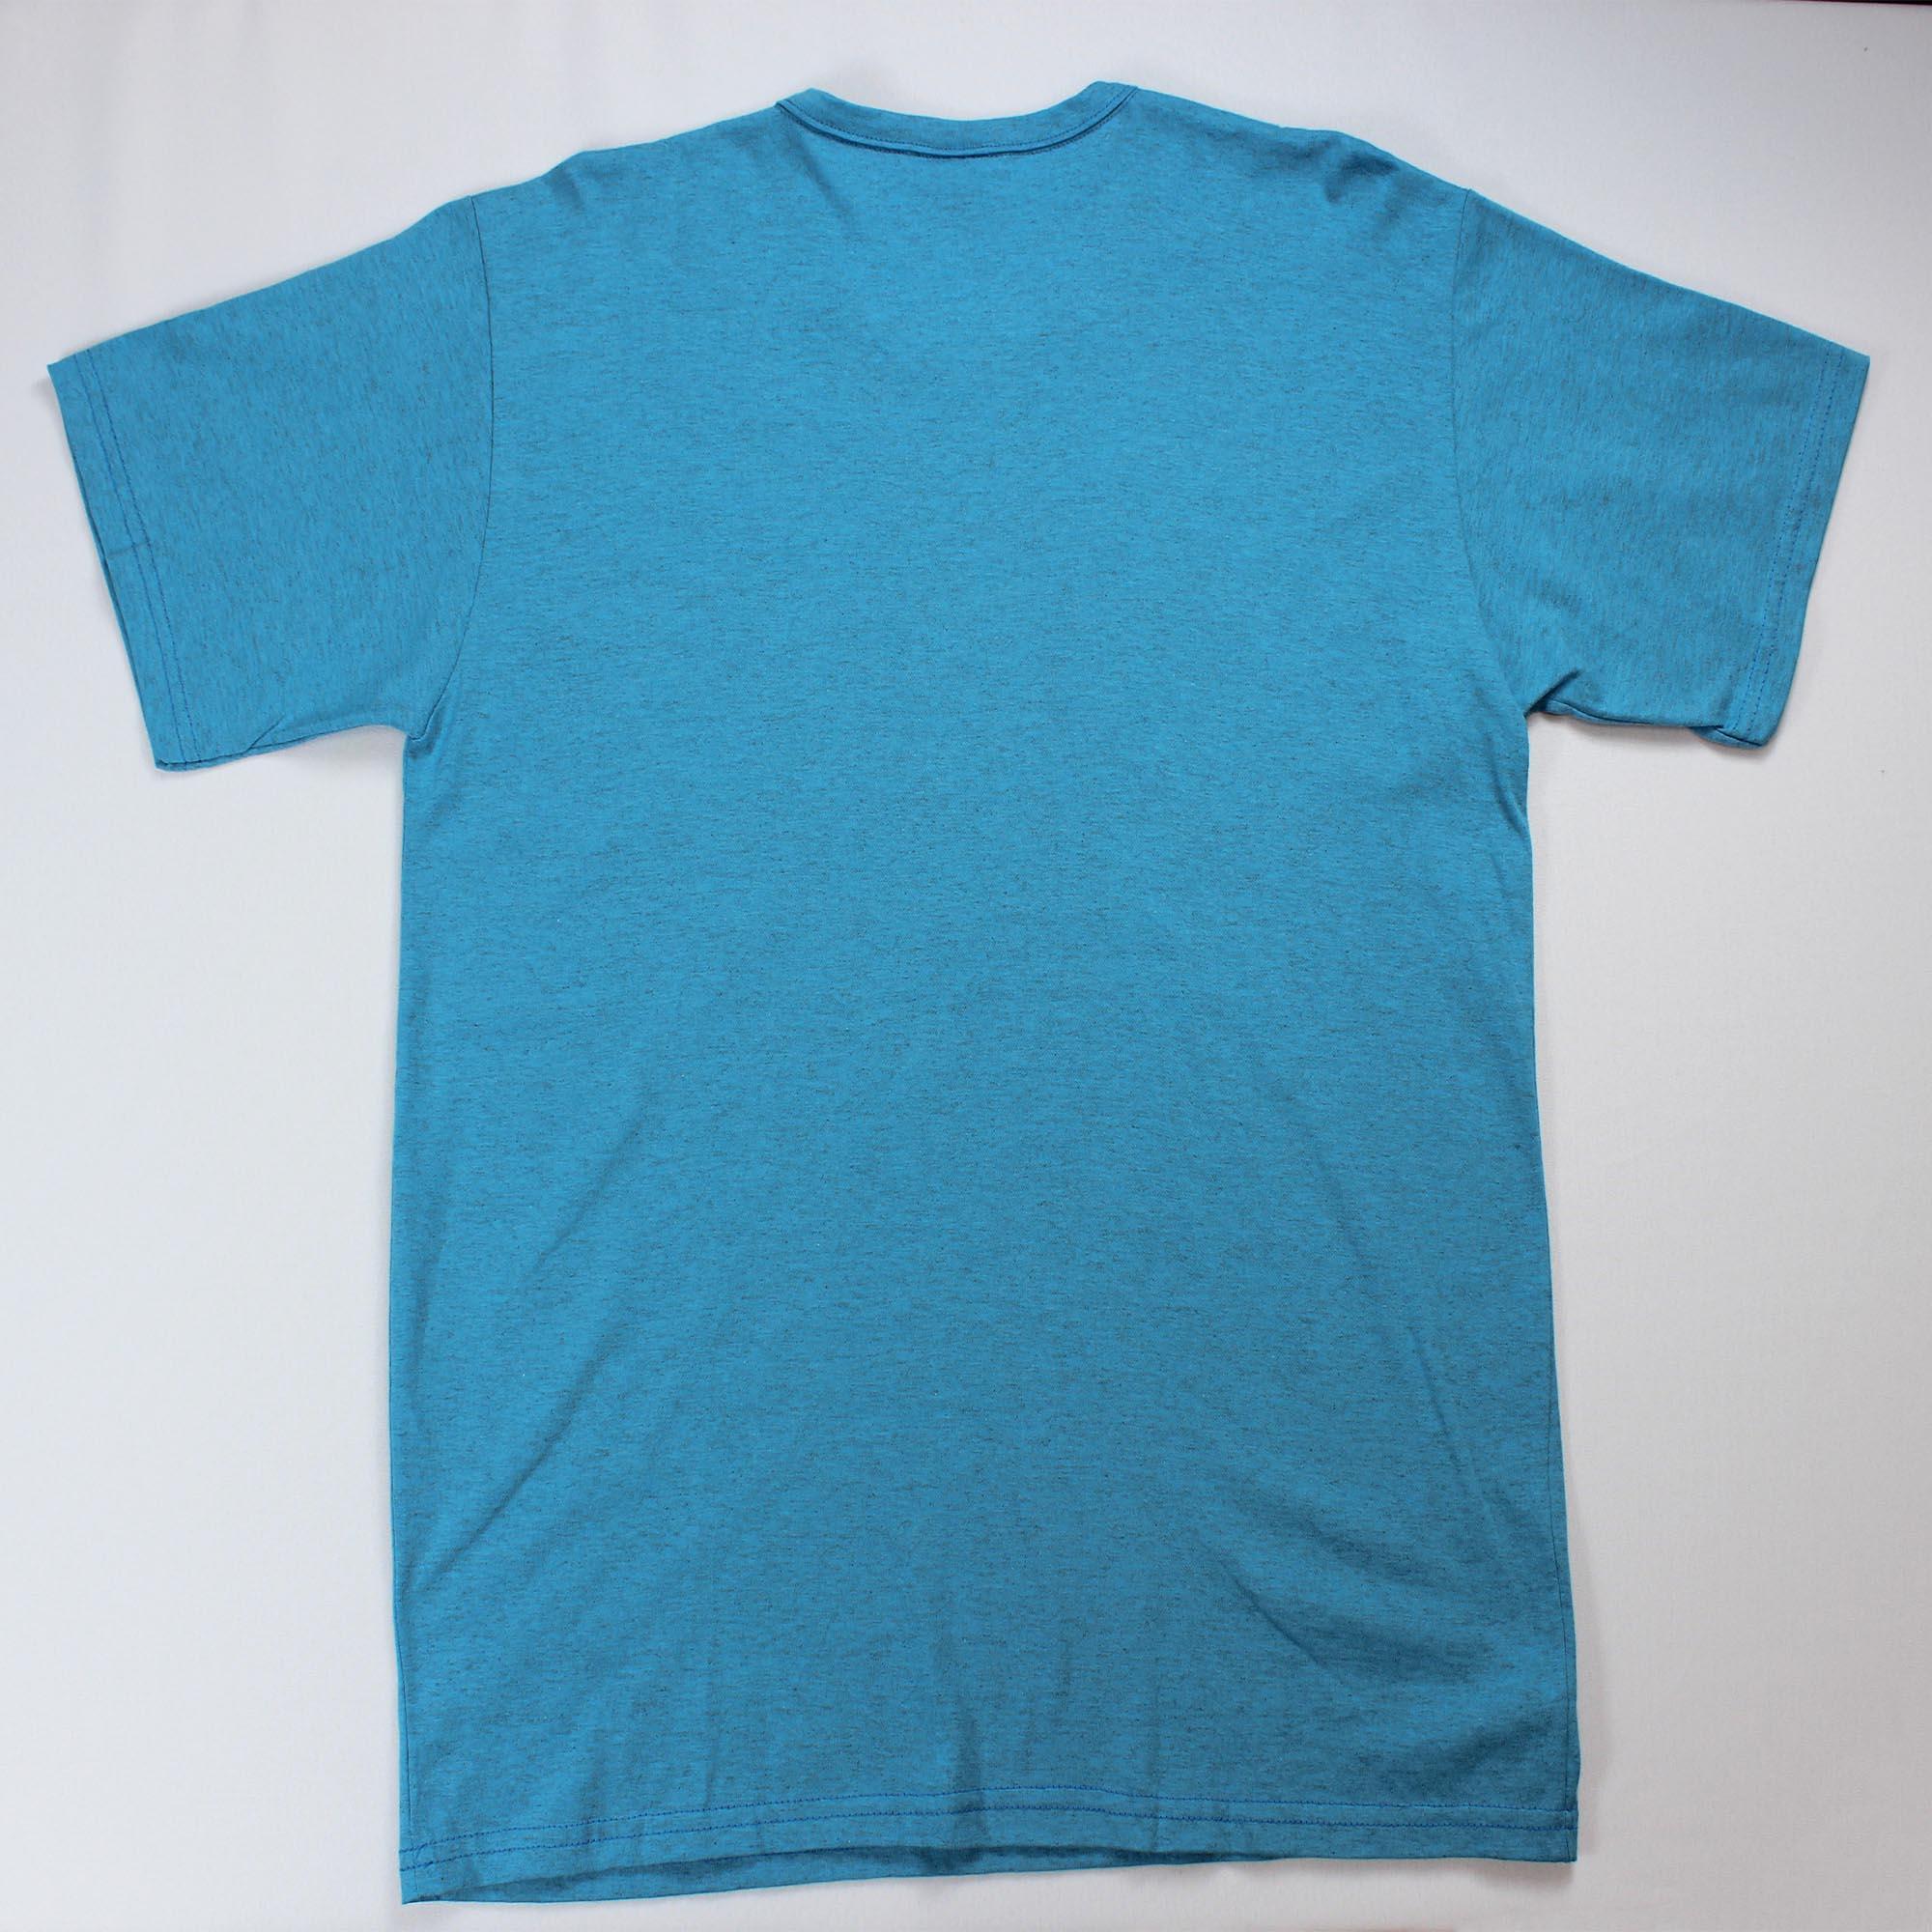 Camiseta Estampada Masculina - Tamanho G